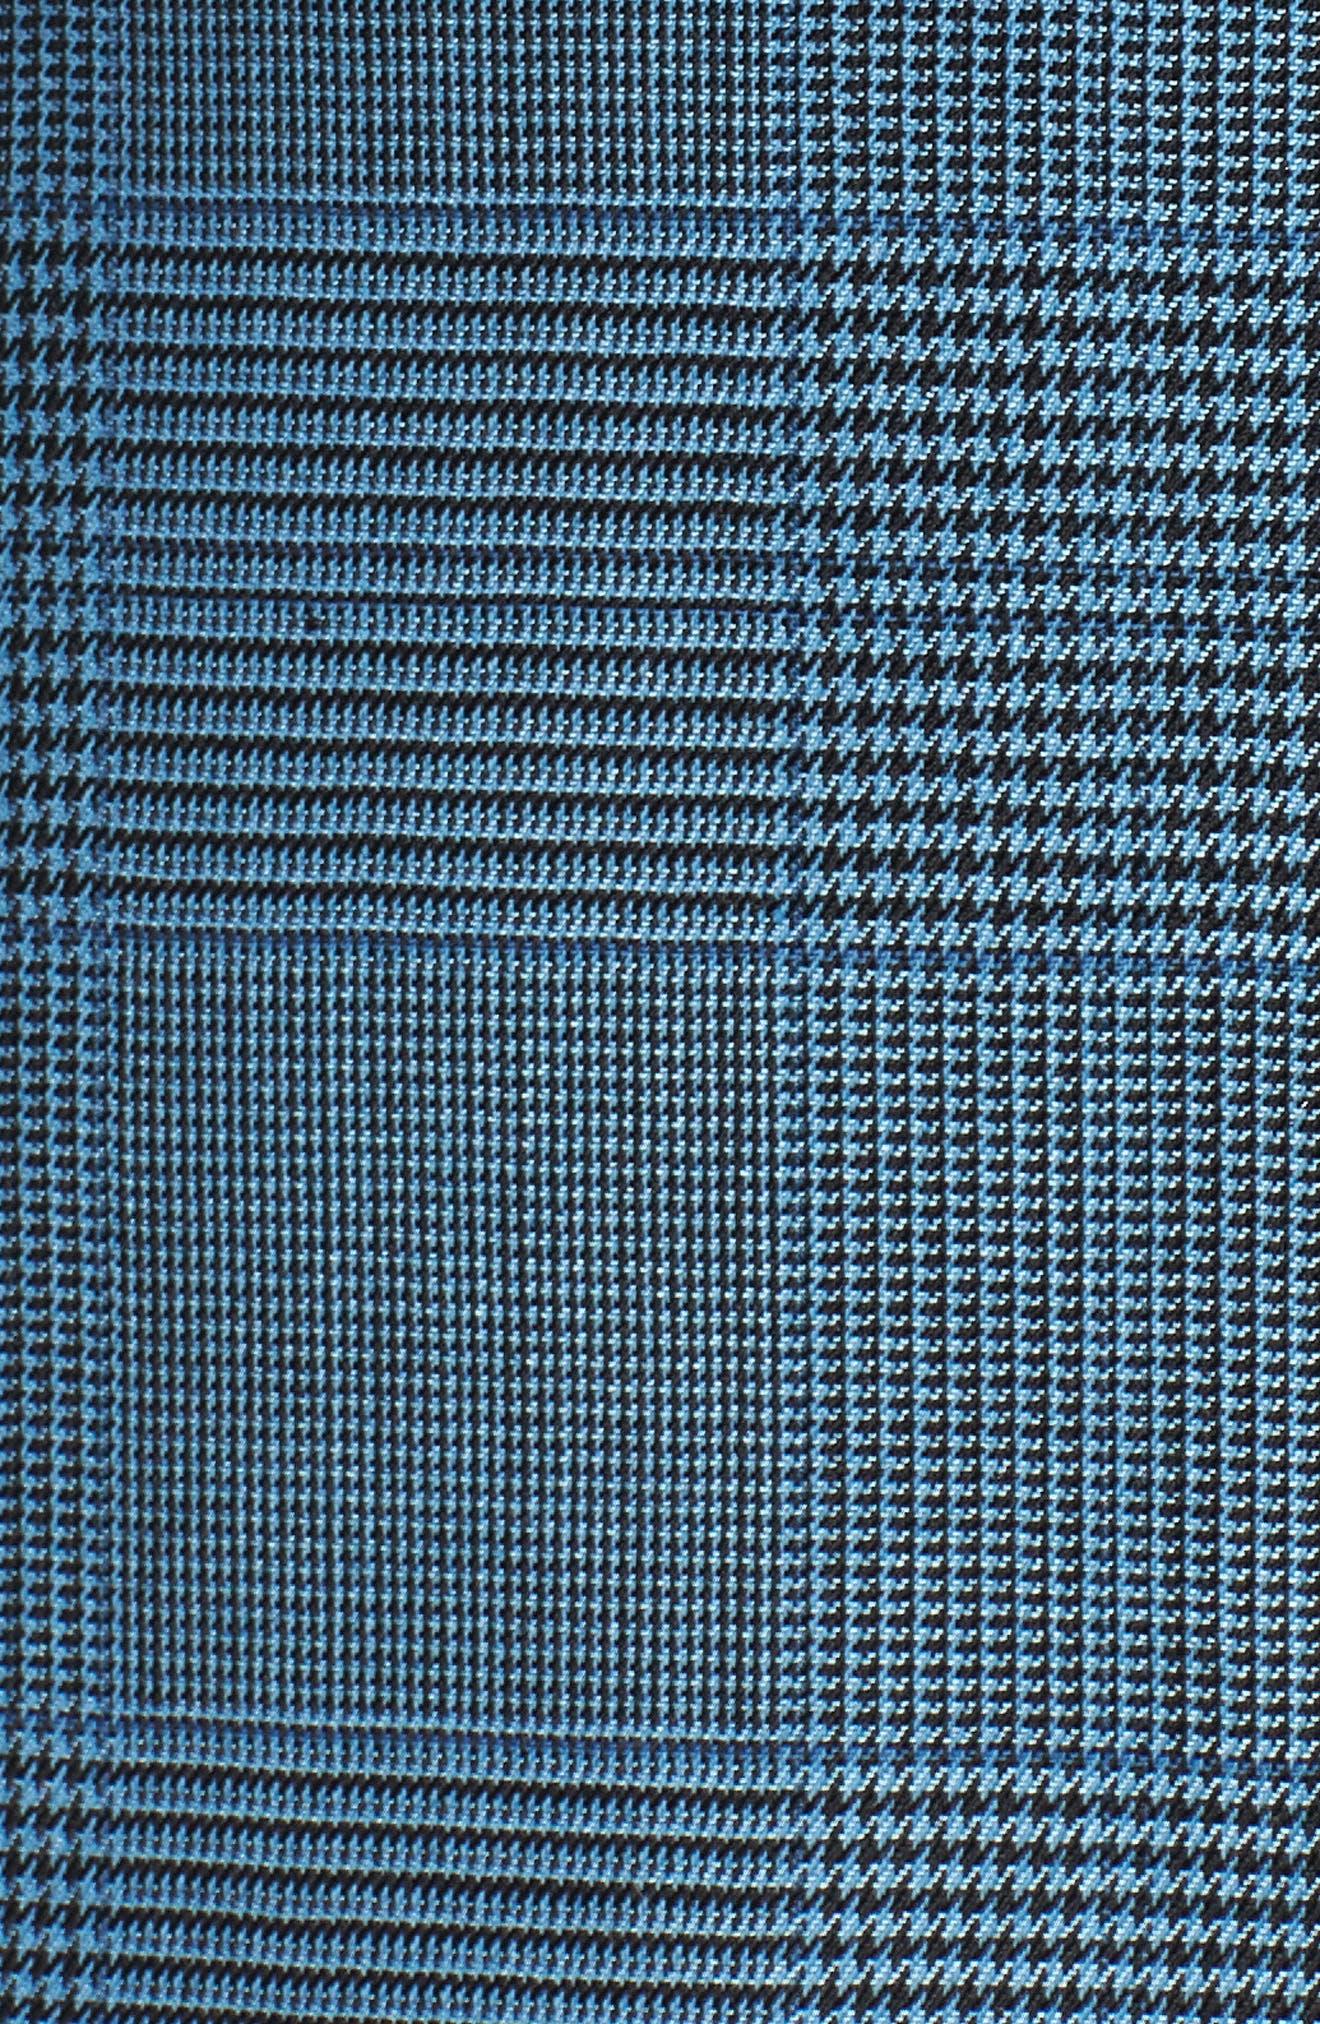 Jelaya Glencheck Double Breasted Suit Jacket,                             Alternate thumbnail 5, color,                             Sailor Blue Fantasy